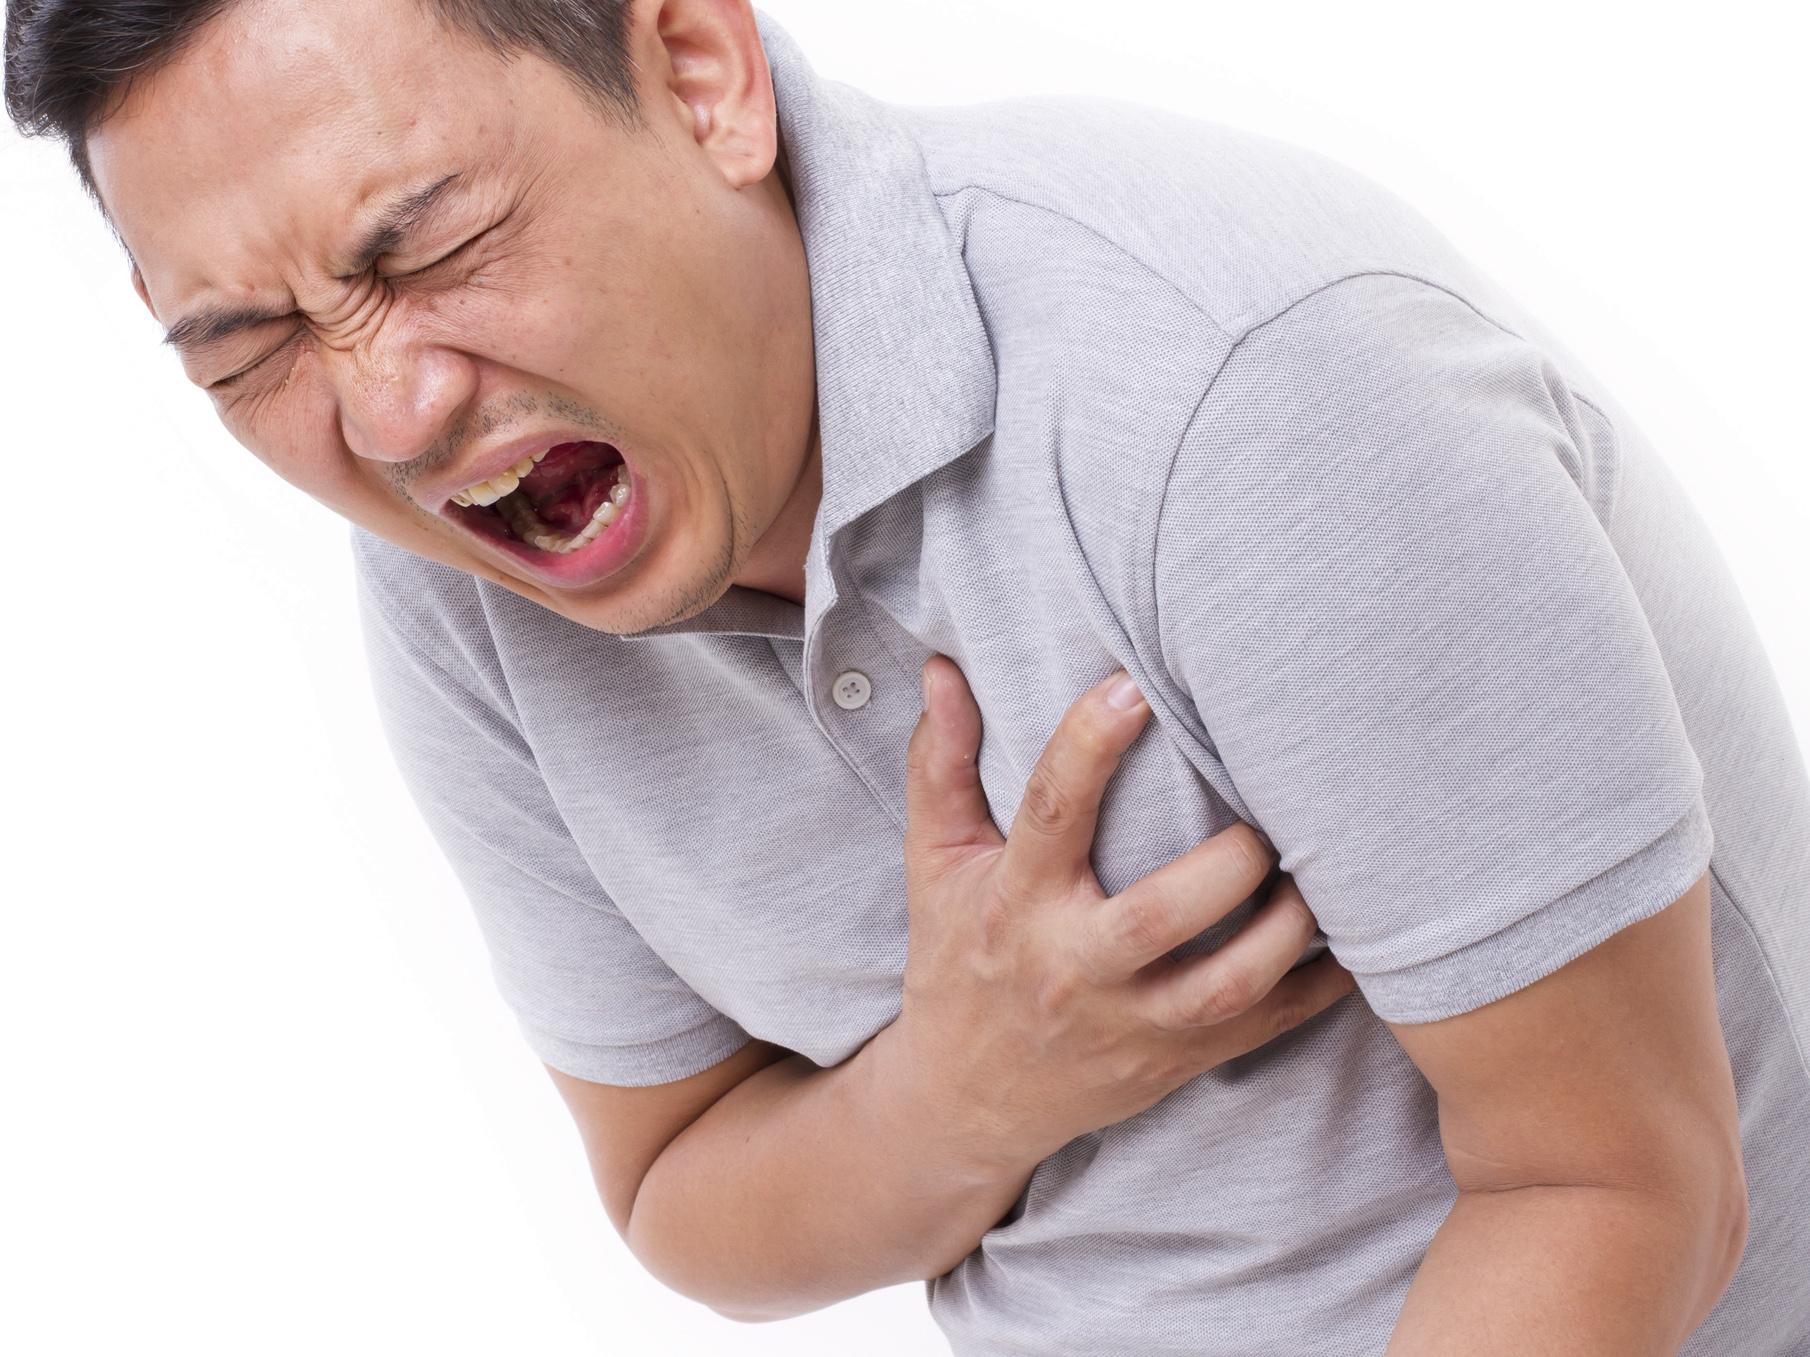 Hasil gambar untuk penyakit jantung